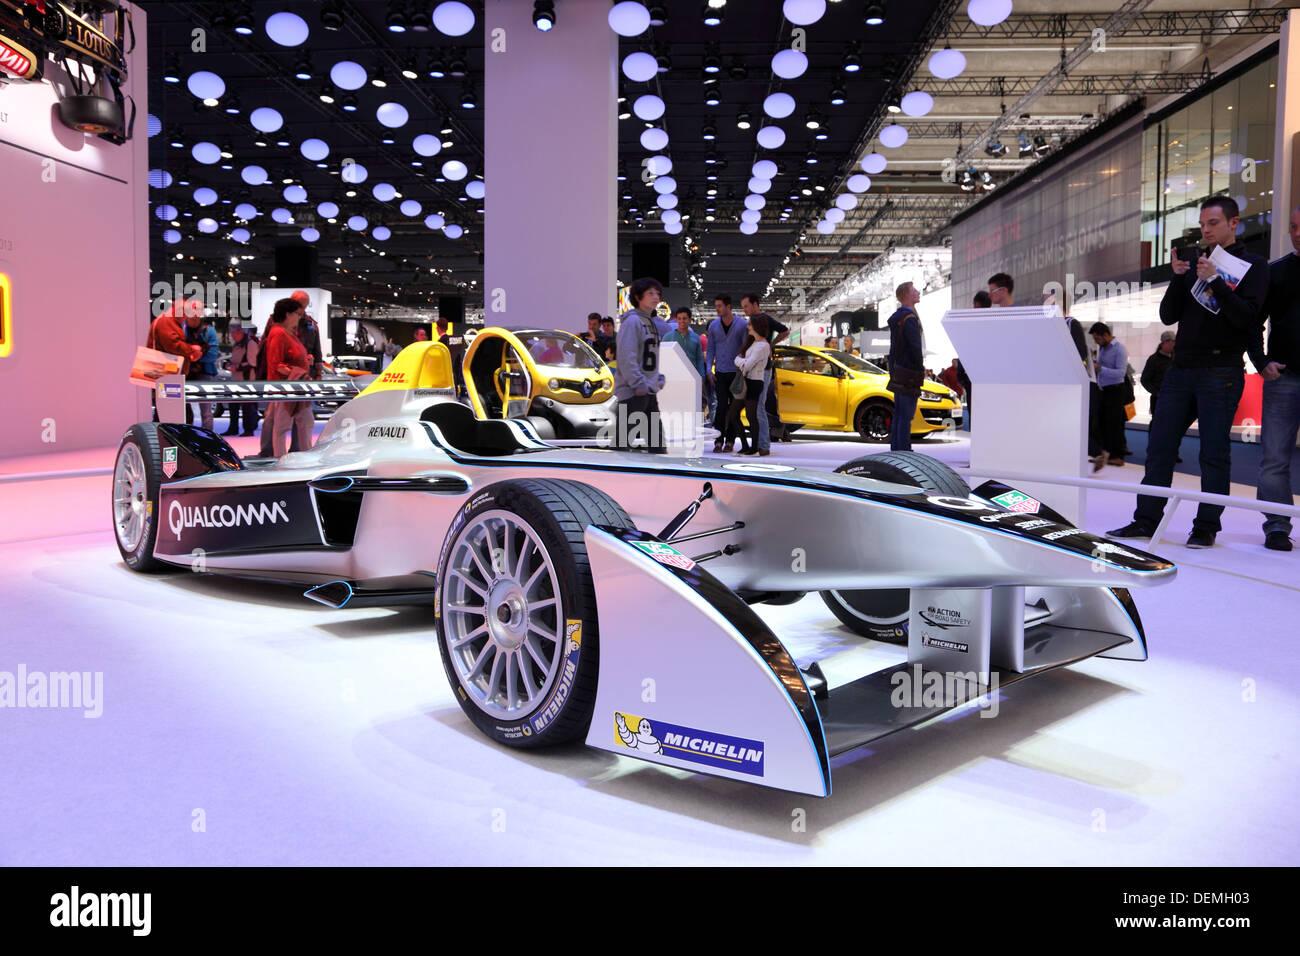 Renault  Formula One Racing Car at the 65th IAA in Frankfurt, Germany - Stock Image